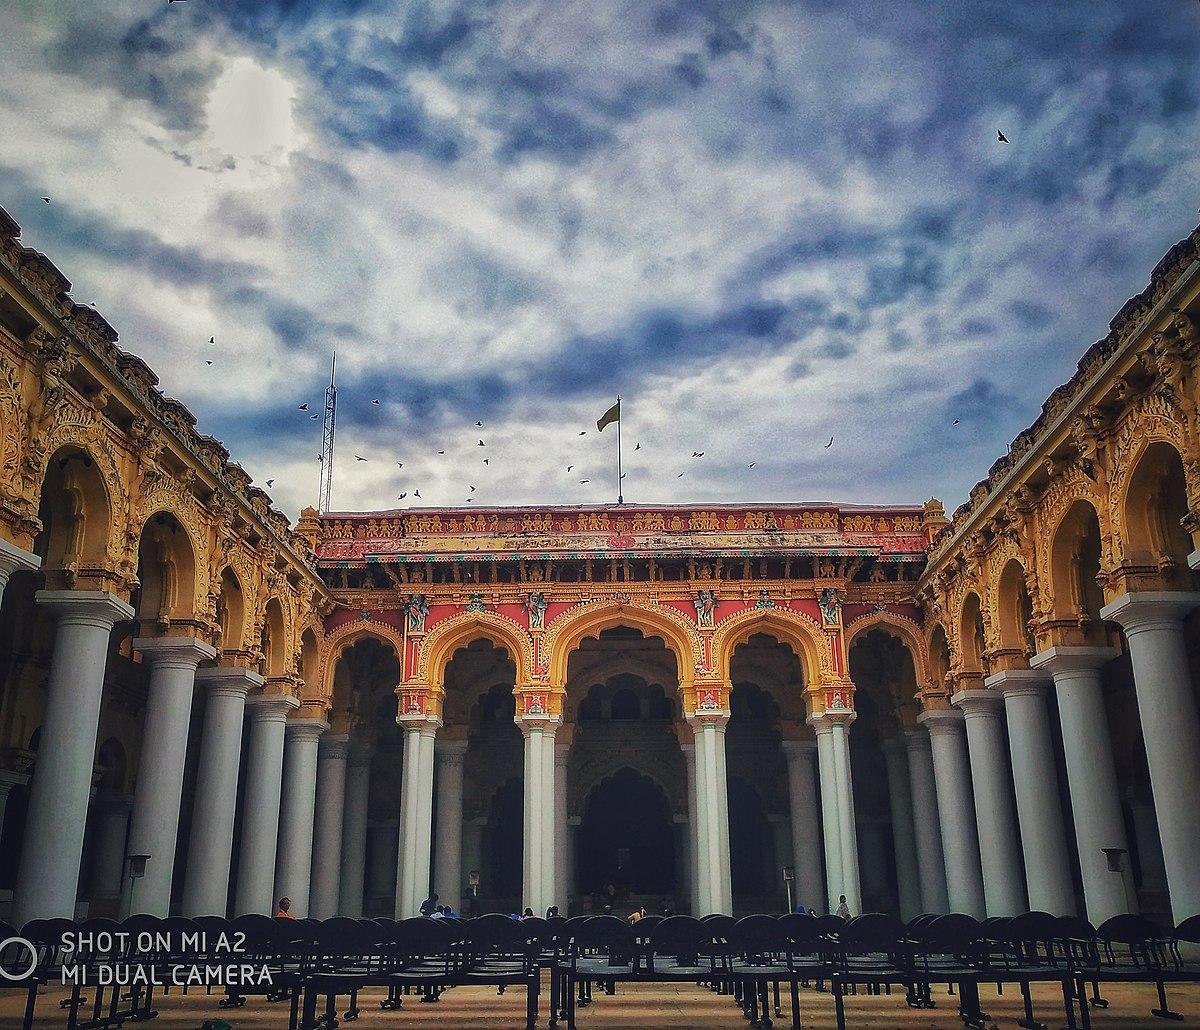 Thirumalai Nayakkar Mahal Wikipedia